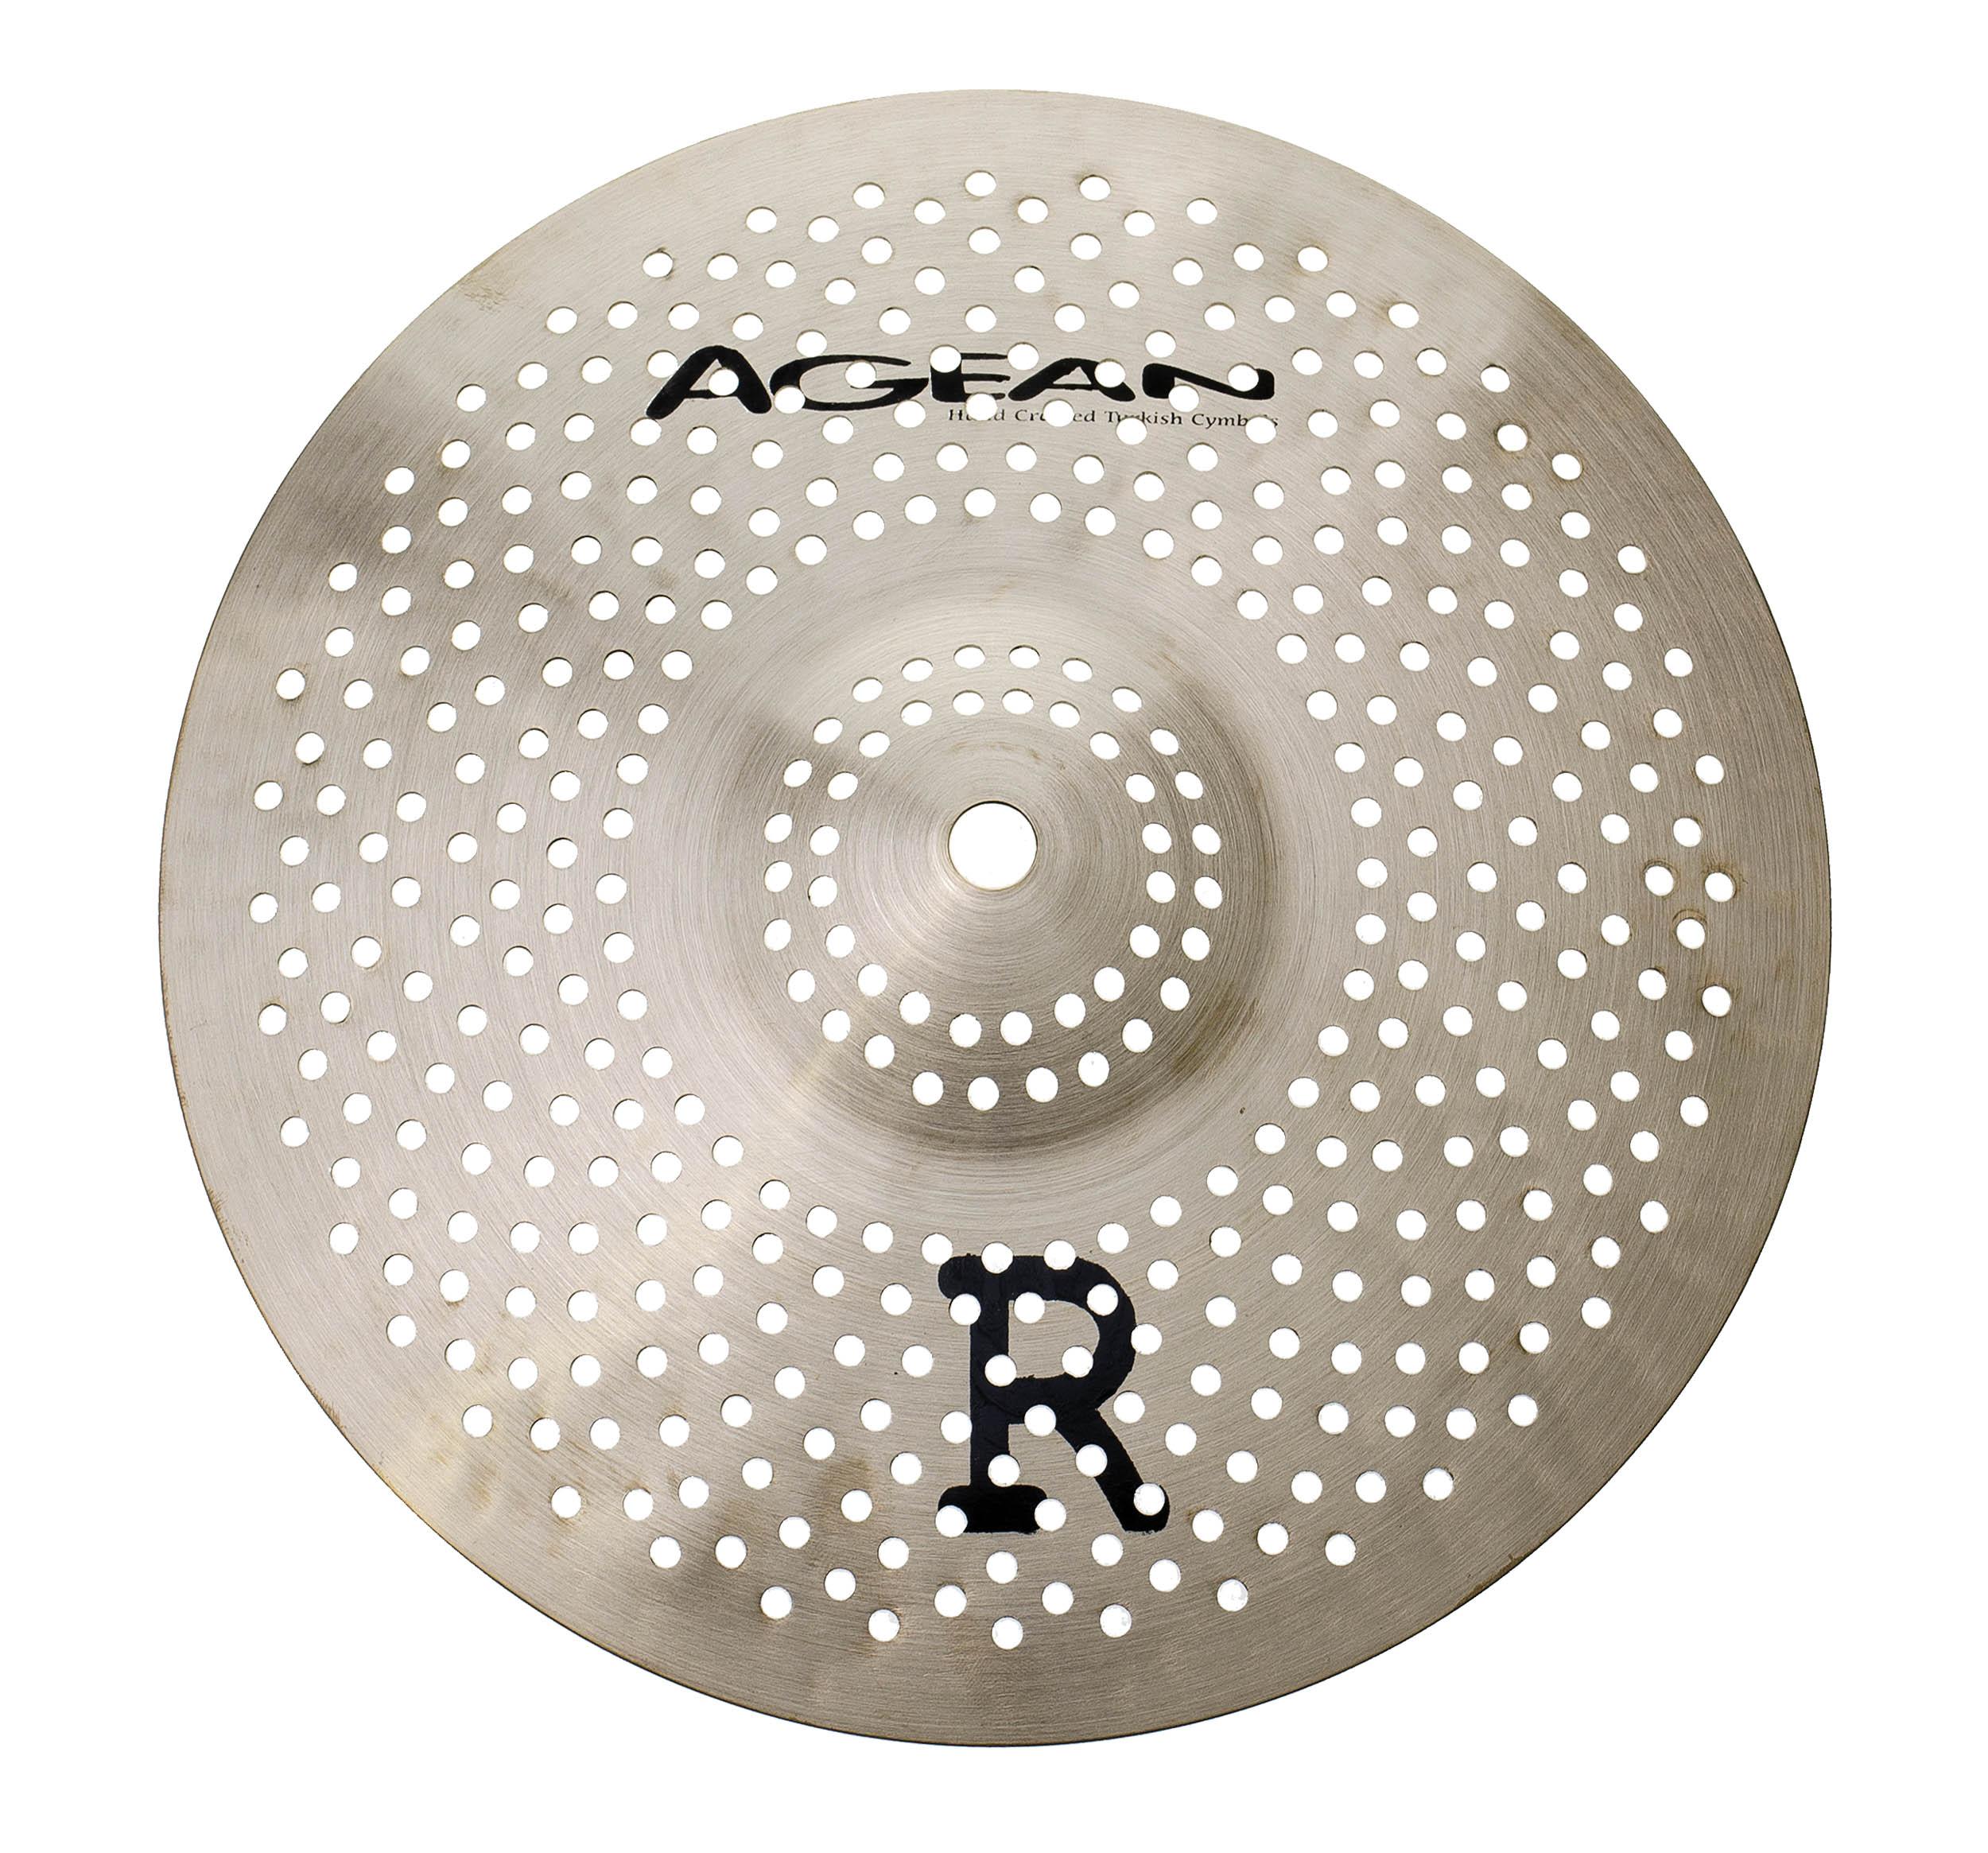 agean r low noise 10 splash real feel practice cymbal drum tec. Black Bedroom Furniture Sets. Home Design Ideas